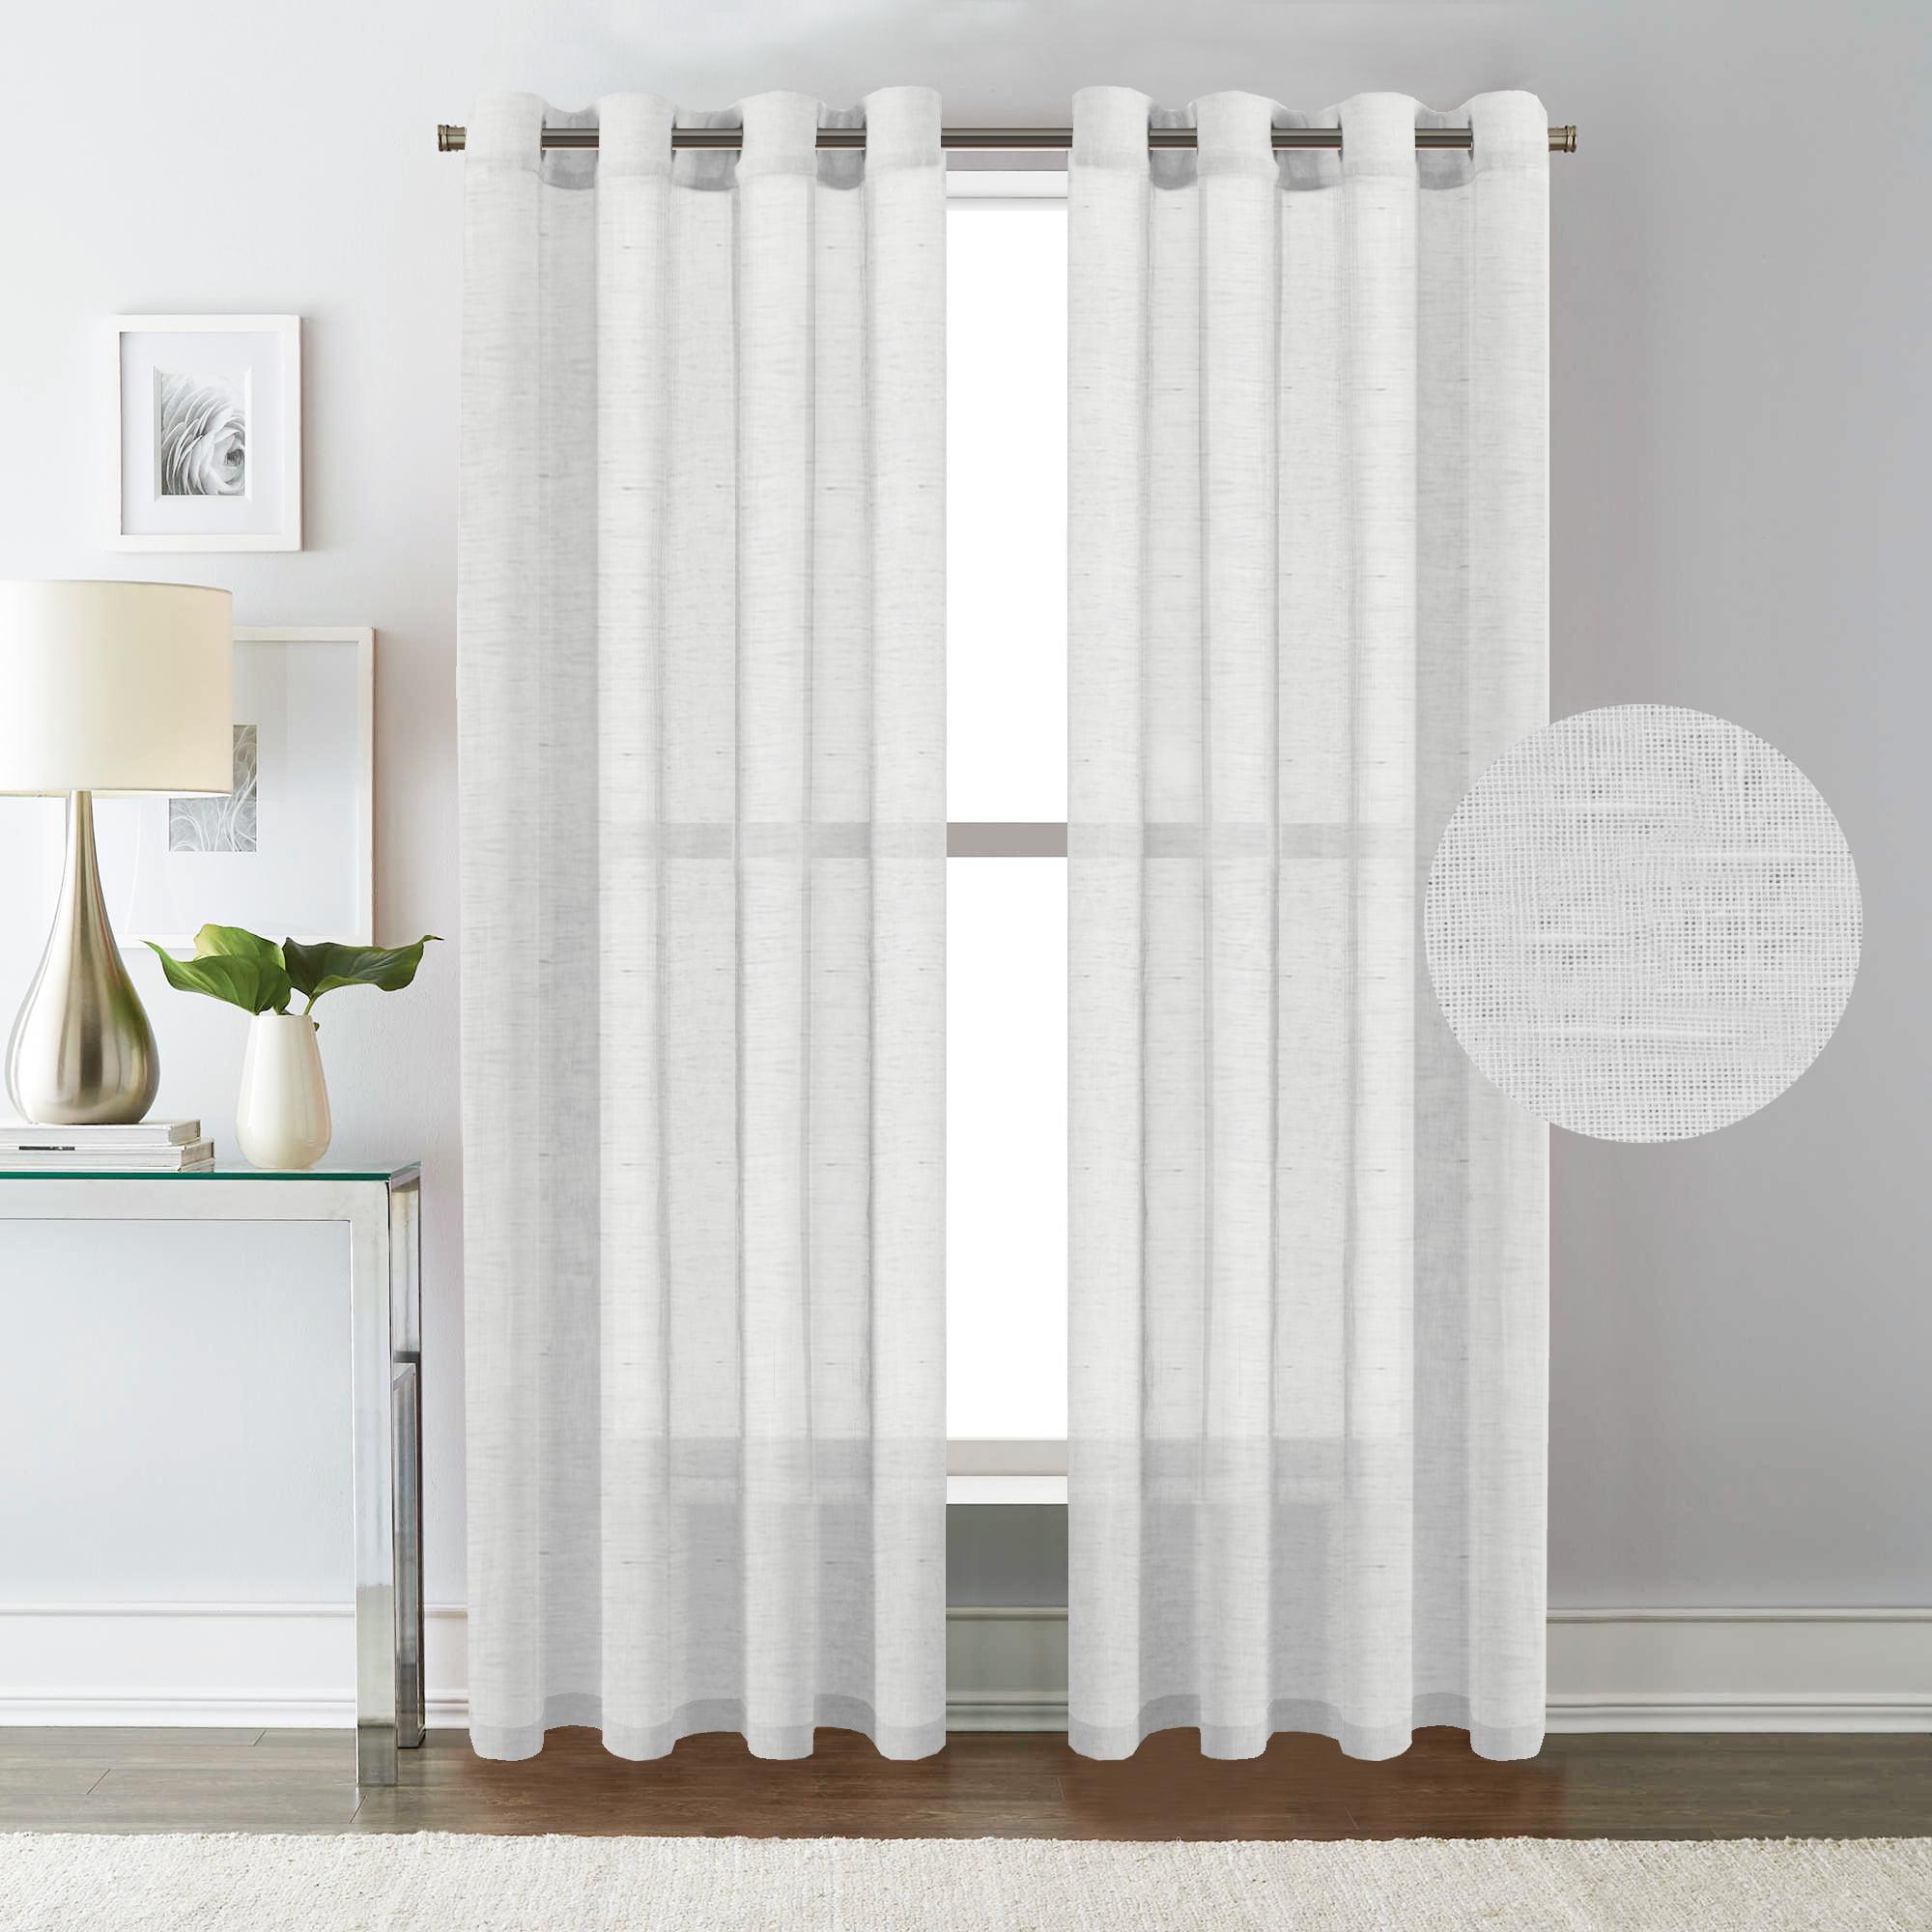 H Versailtex White Curtain Panels Rich Natural Linen Sheer Curtains For Bedroom 2 Panels Elegant Nickel Grommet Top 52x84 Inch Walmart Com Walmart Com